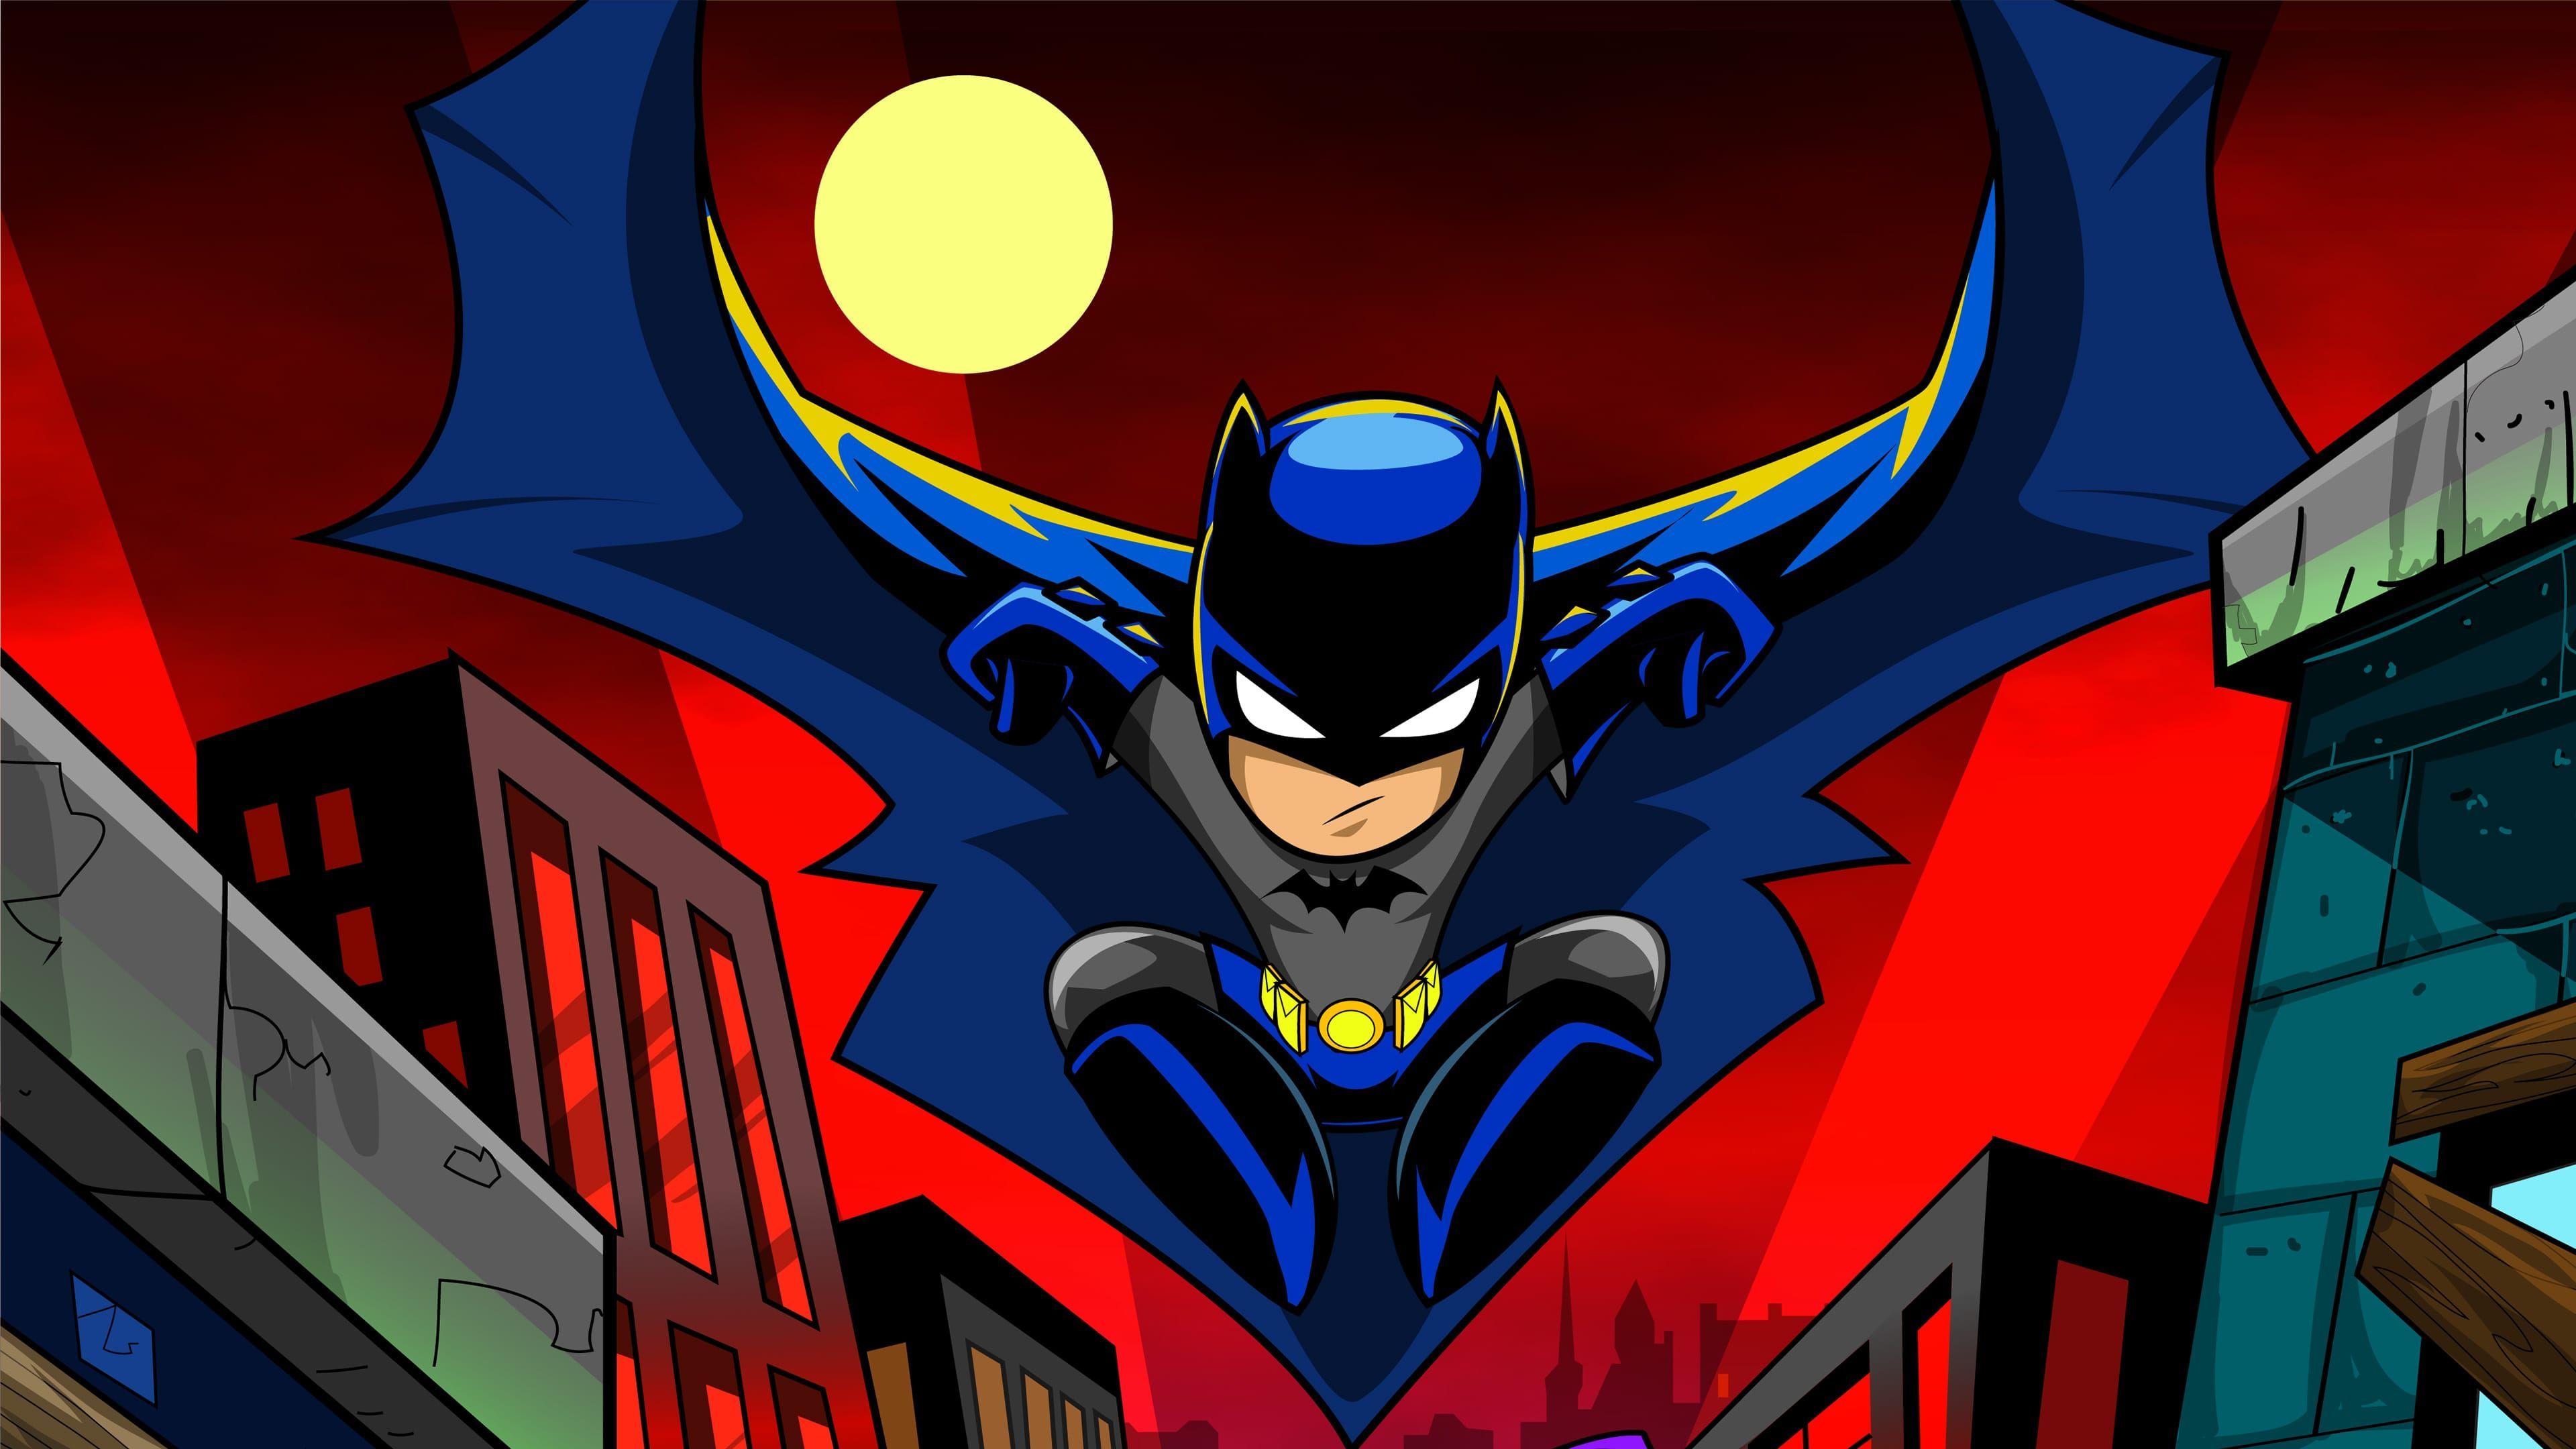 Batman Cartoon Art 4k Cartoon wallpaper, Cartoon